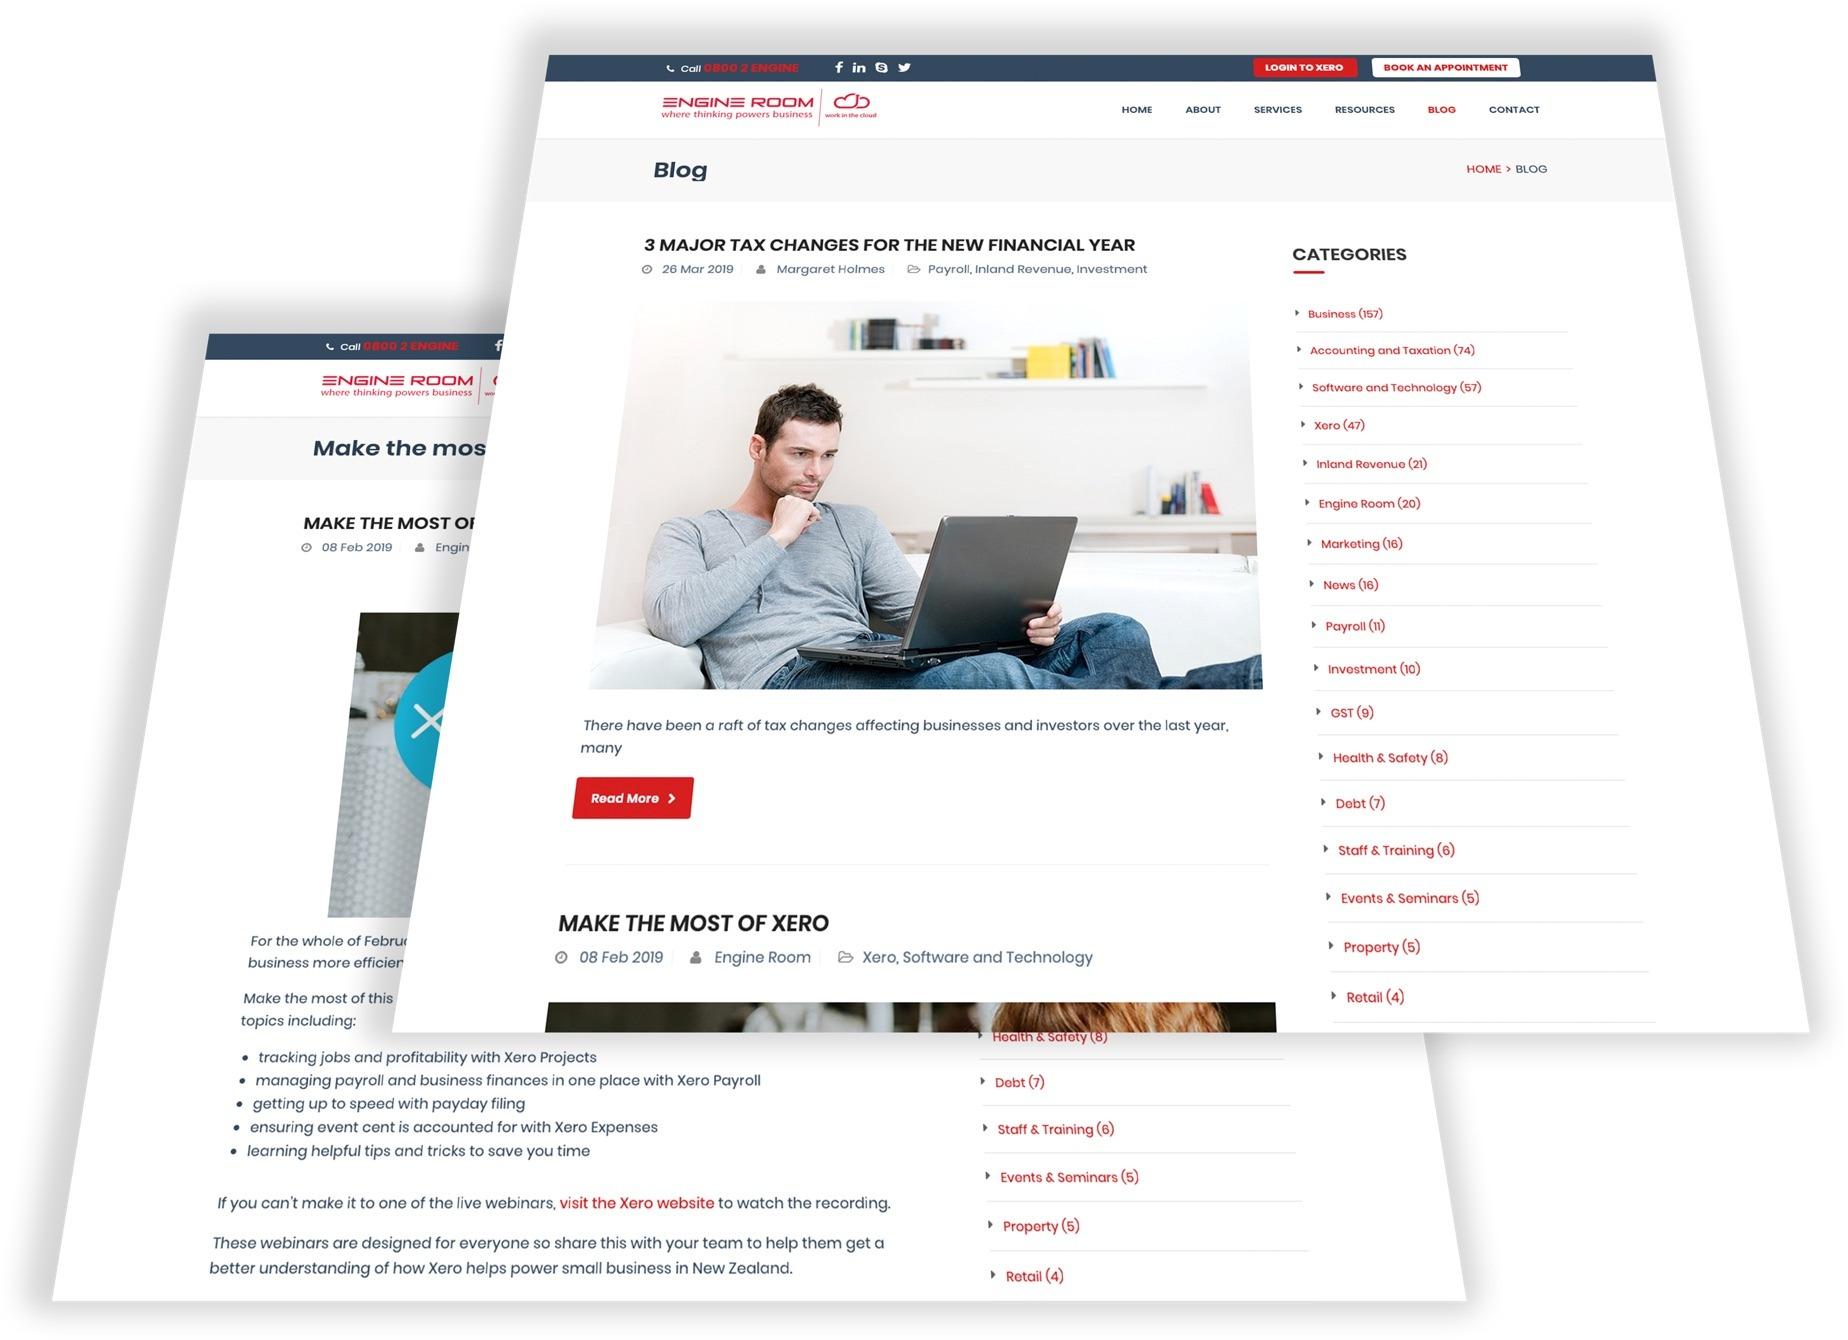 Blogs - Engine Room